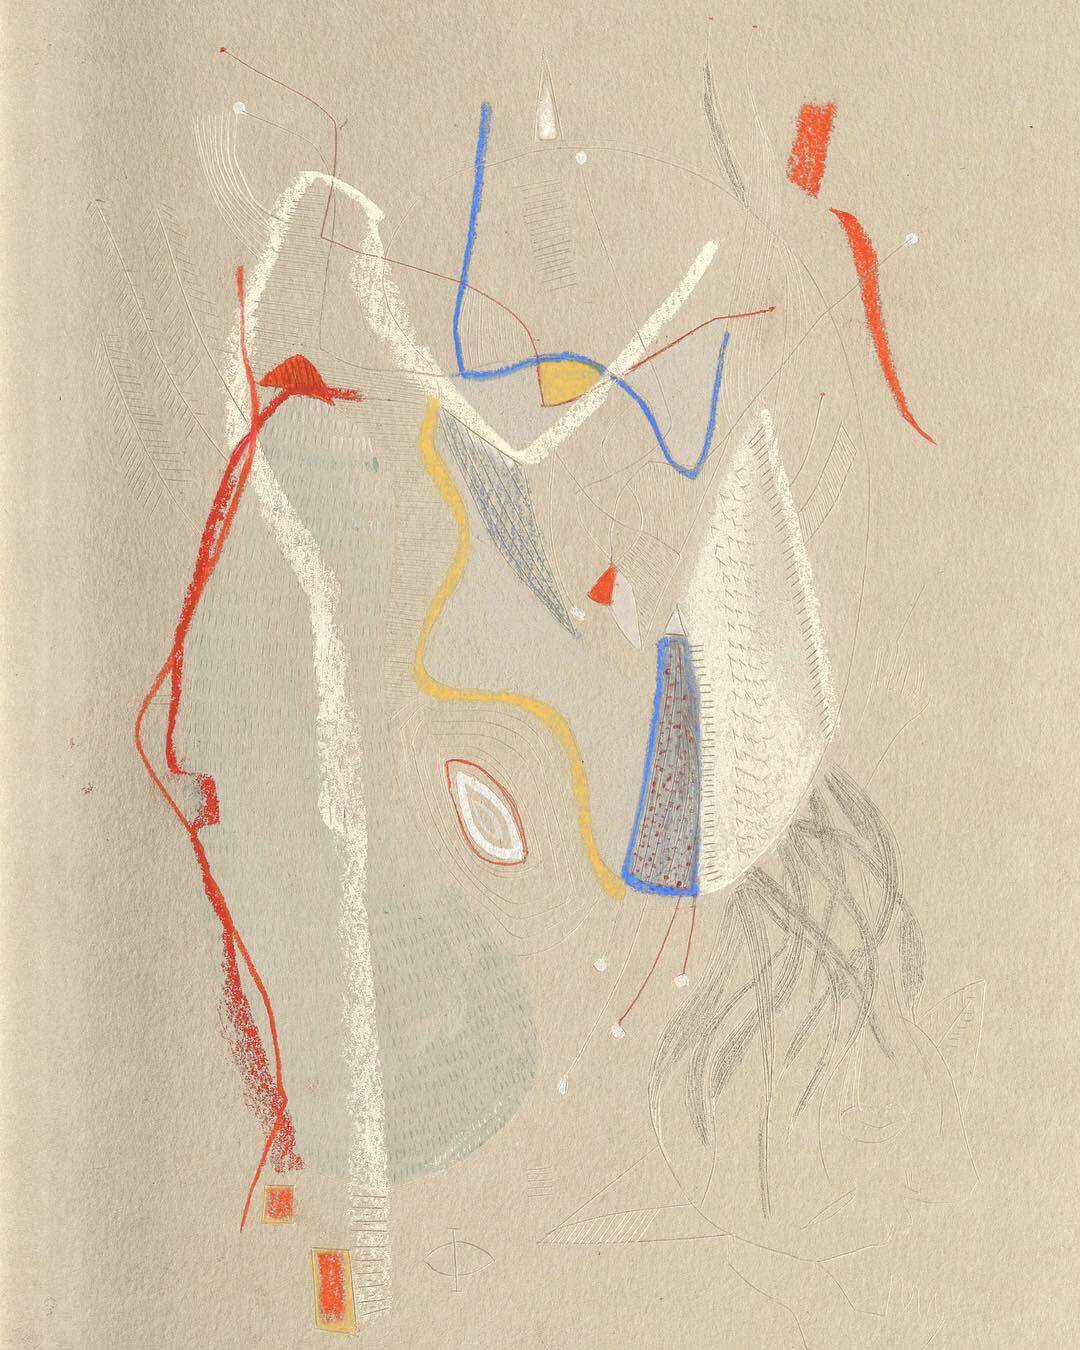 Julia Magdalene Rómas Drawings